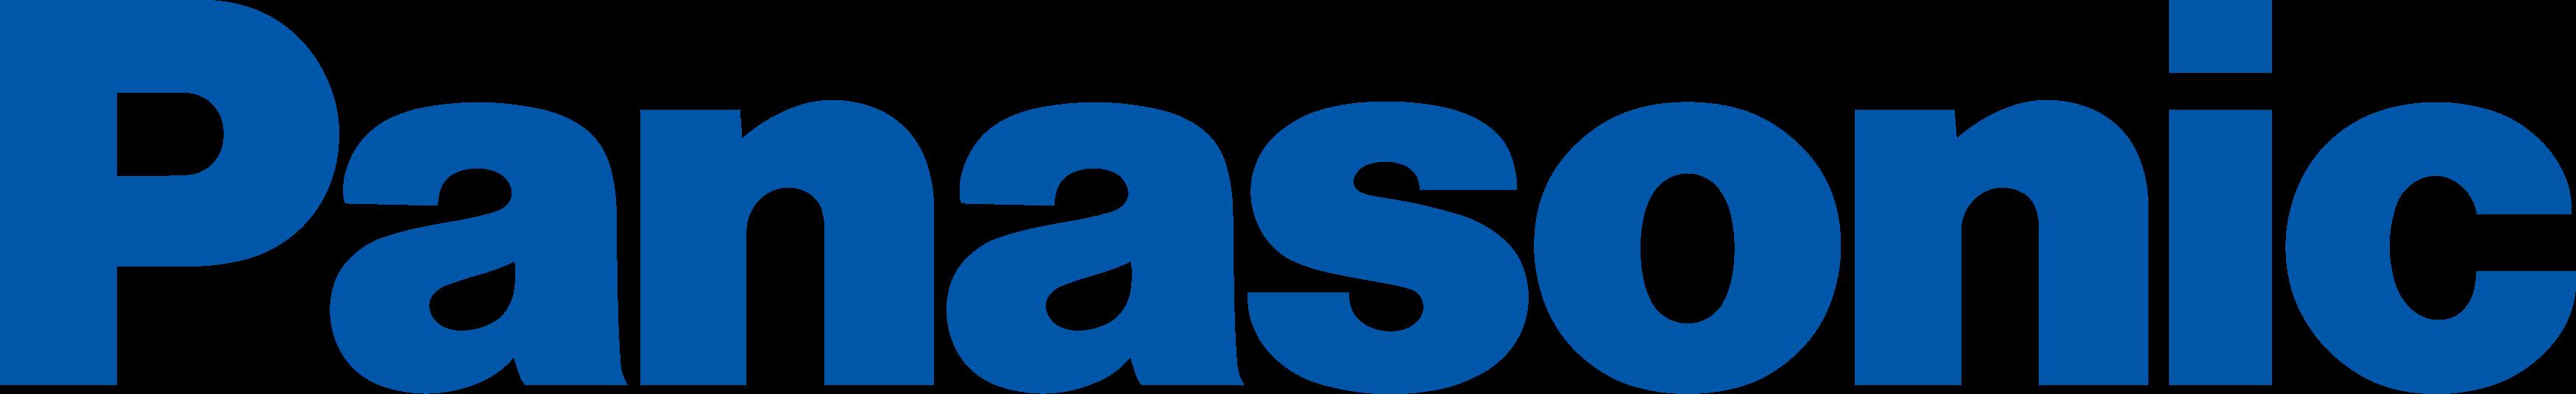 panasonic logo - Panasonic Logo